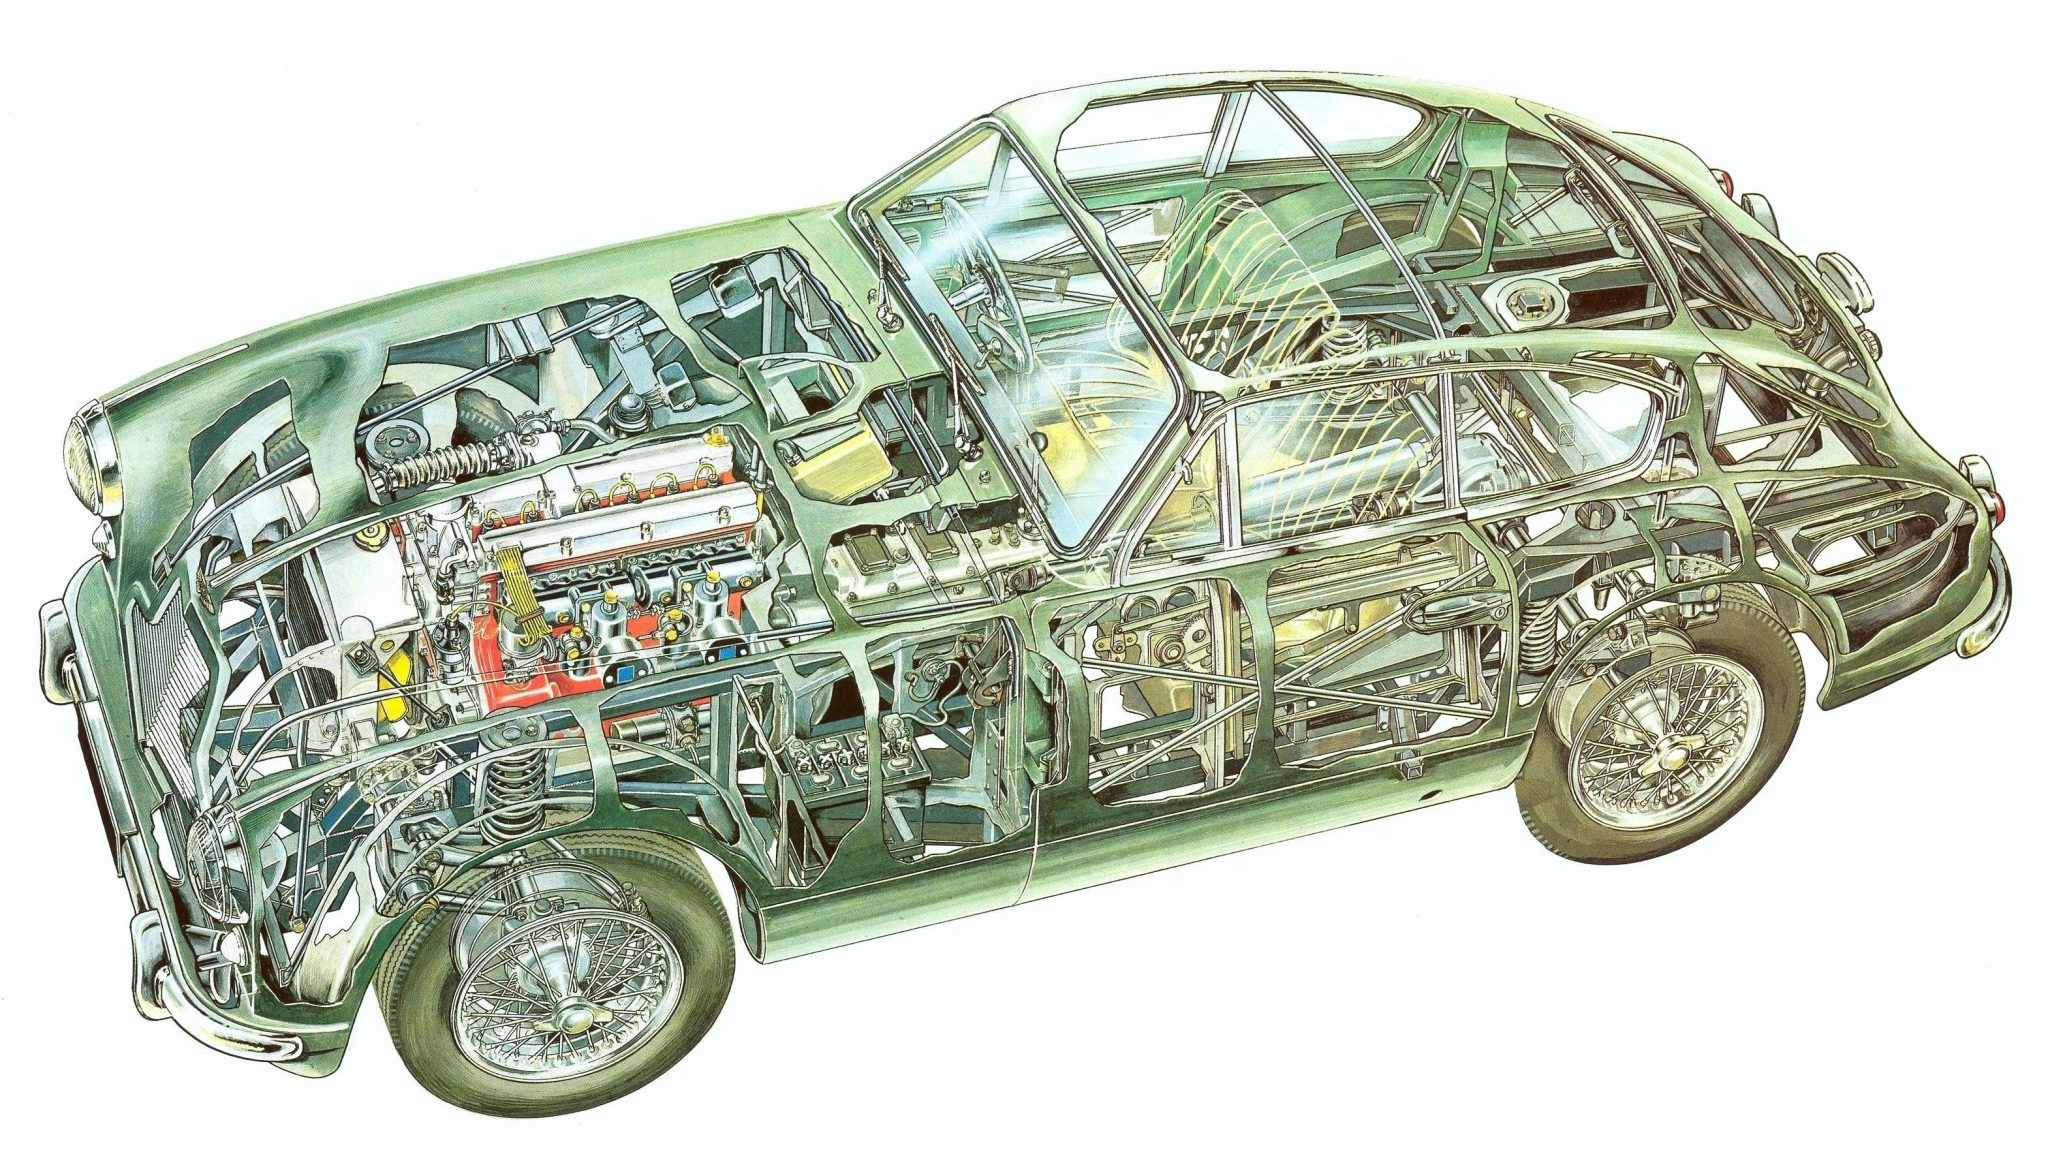 astonmartindb2db24kopie Aston Martin DB2 Cutaway